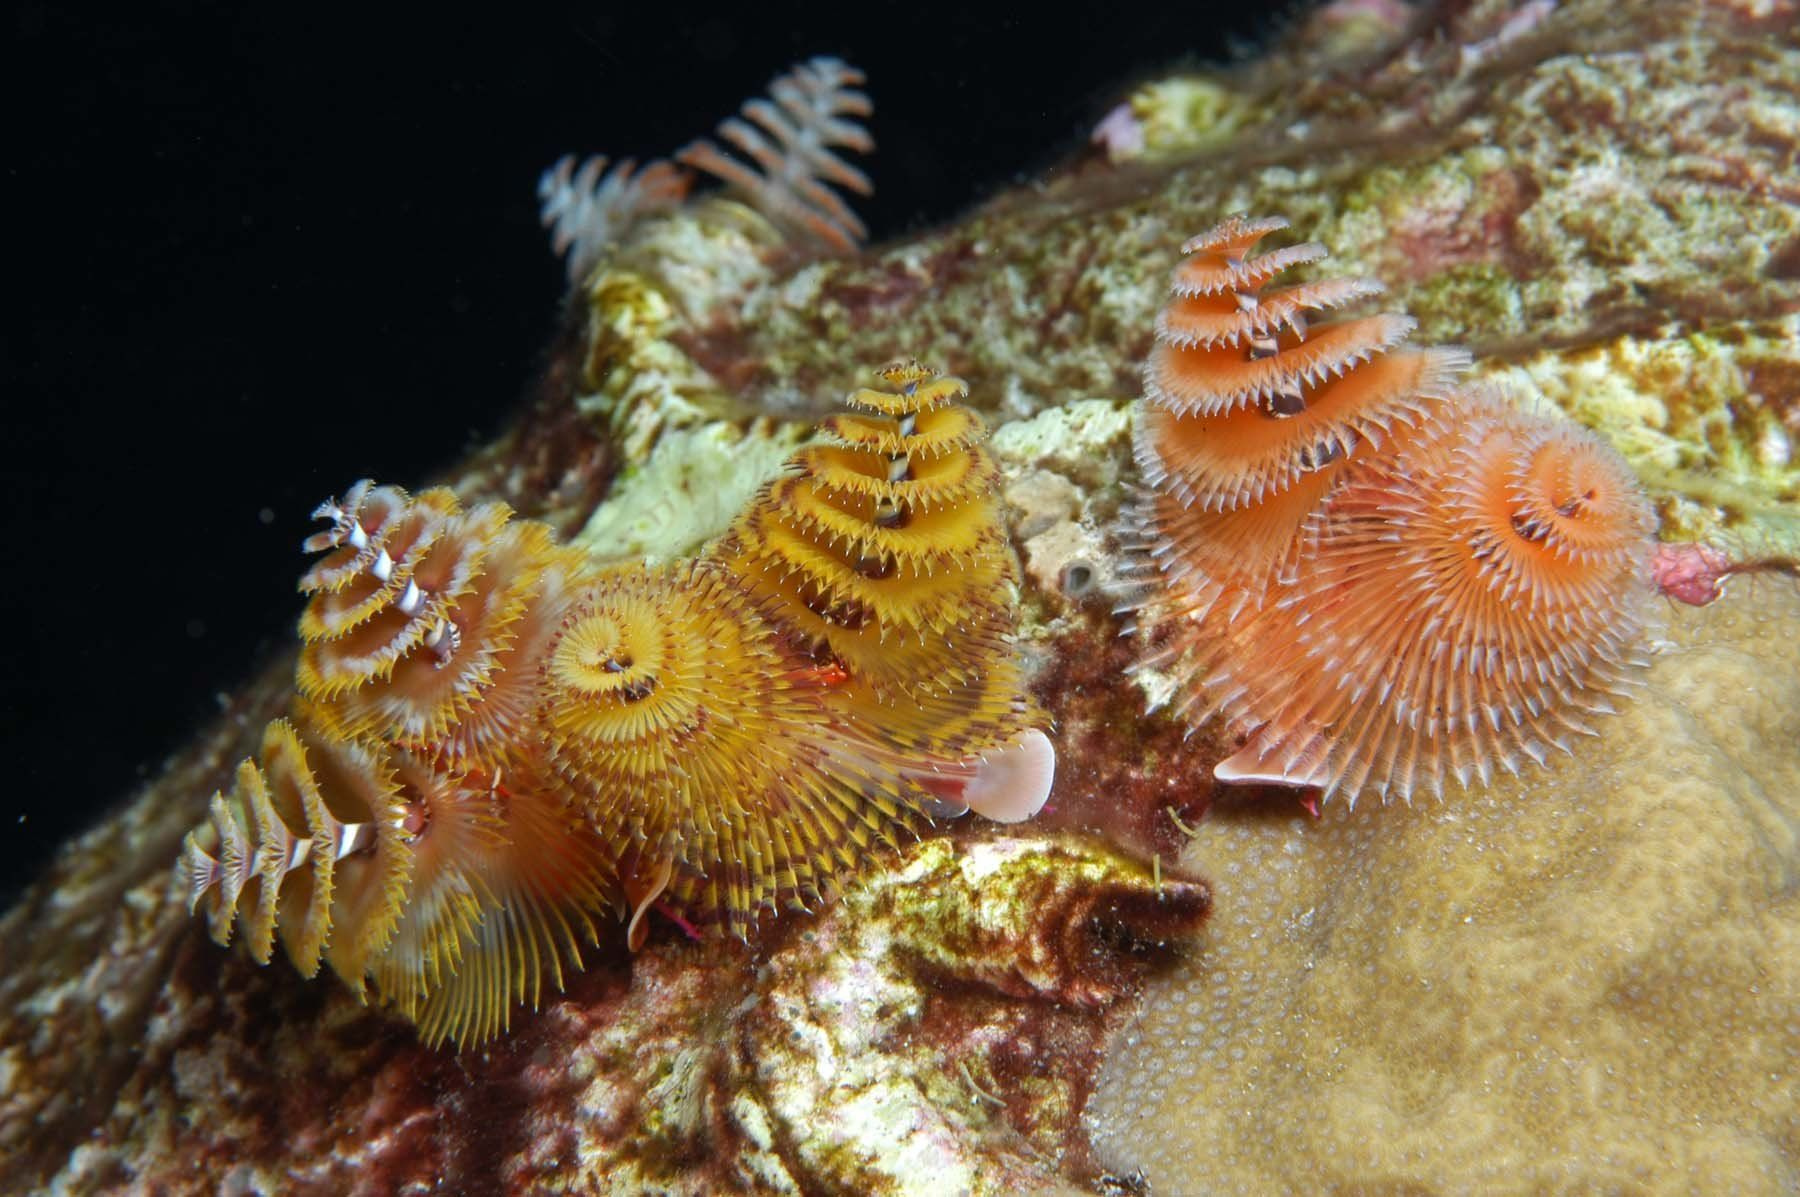 History Travel Arts Science People Places National Marine Sanctuary Ocean Habitat Marine